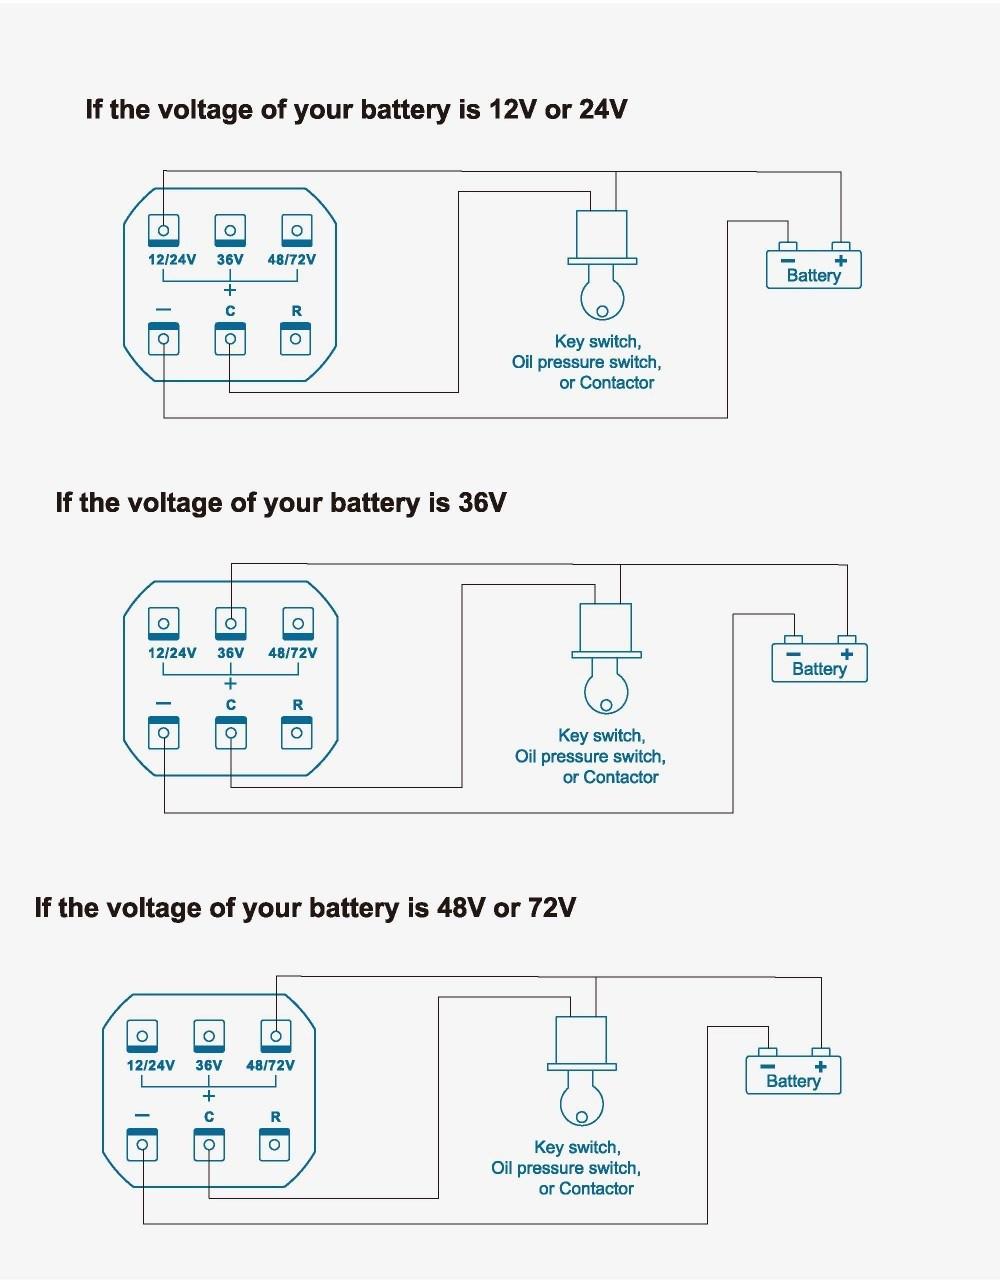 12v 24v 36v 48v 72v Battery Status Charge Led Digital Indicator Wiring Diagram 1 English User Manual